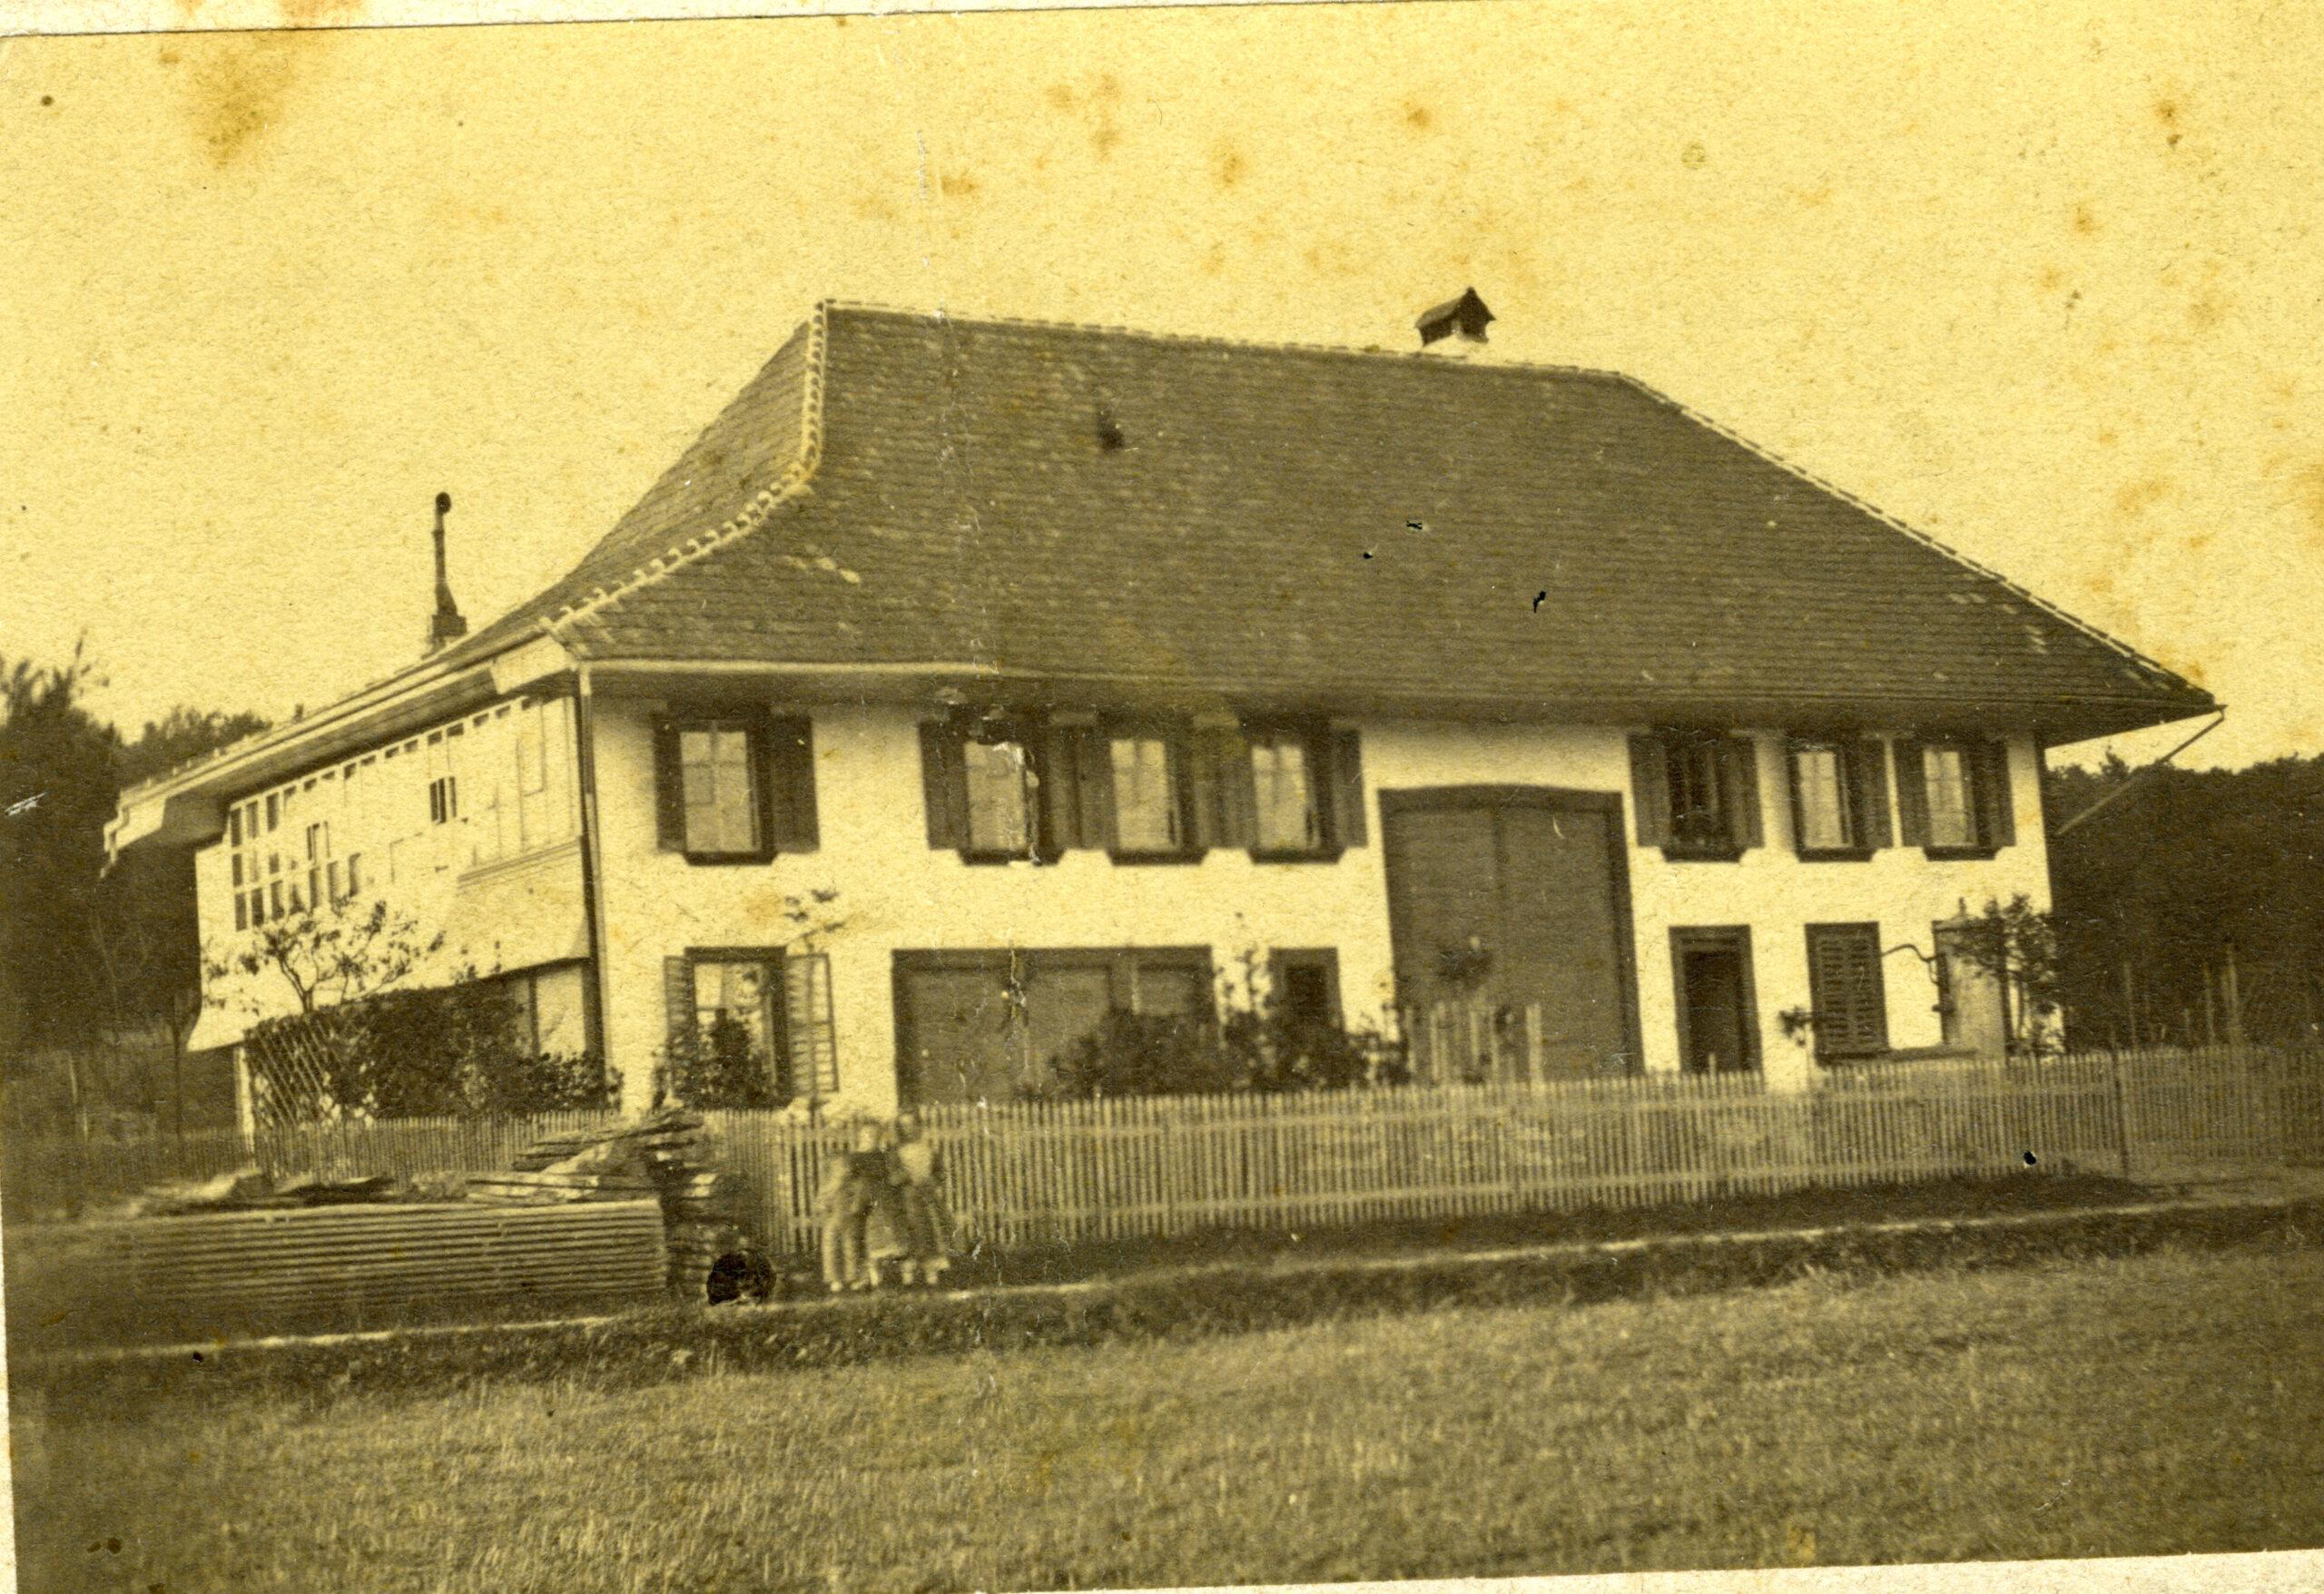 The very early Heuer atelier in Brugg / Switzerland 1864 - 1867